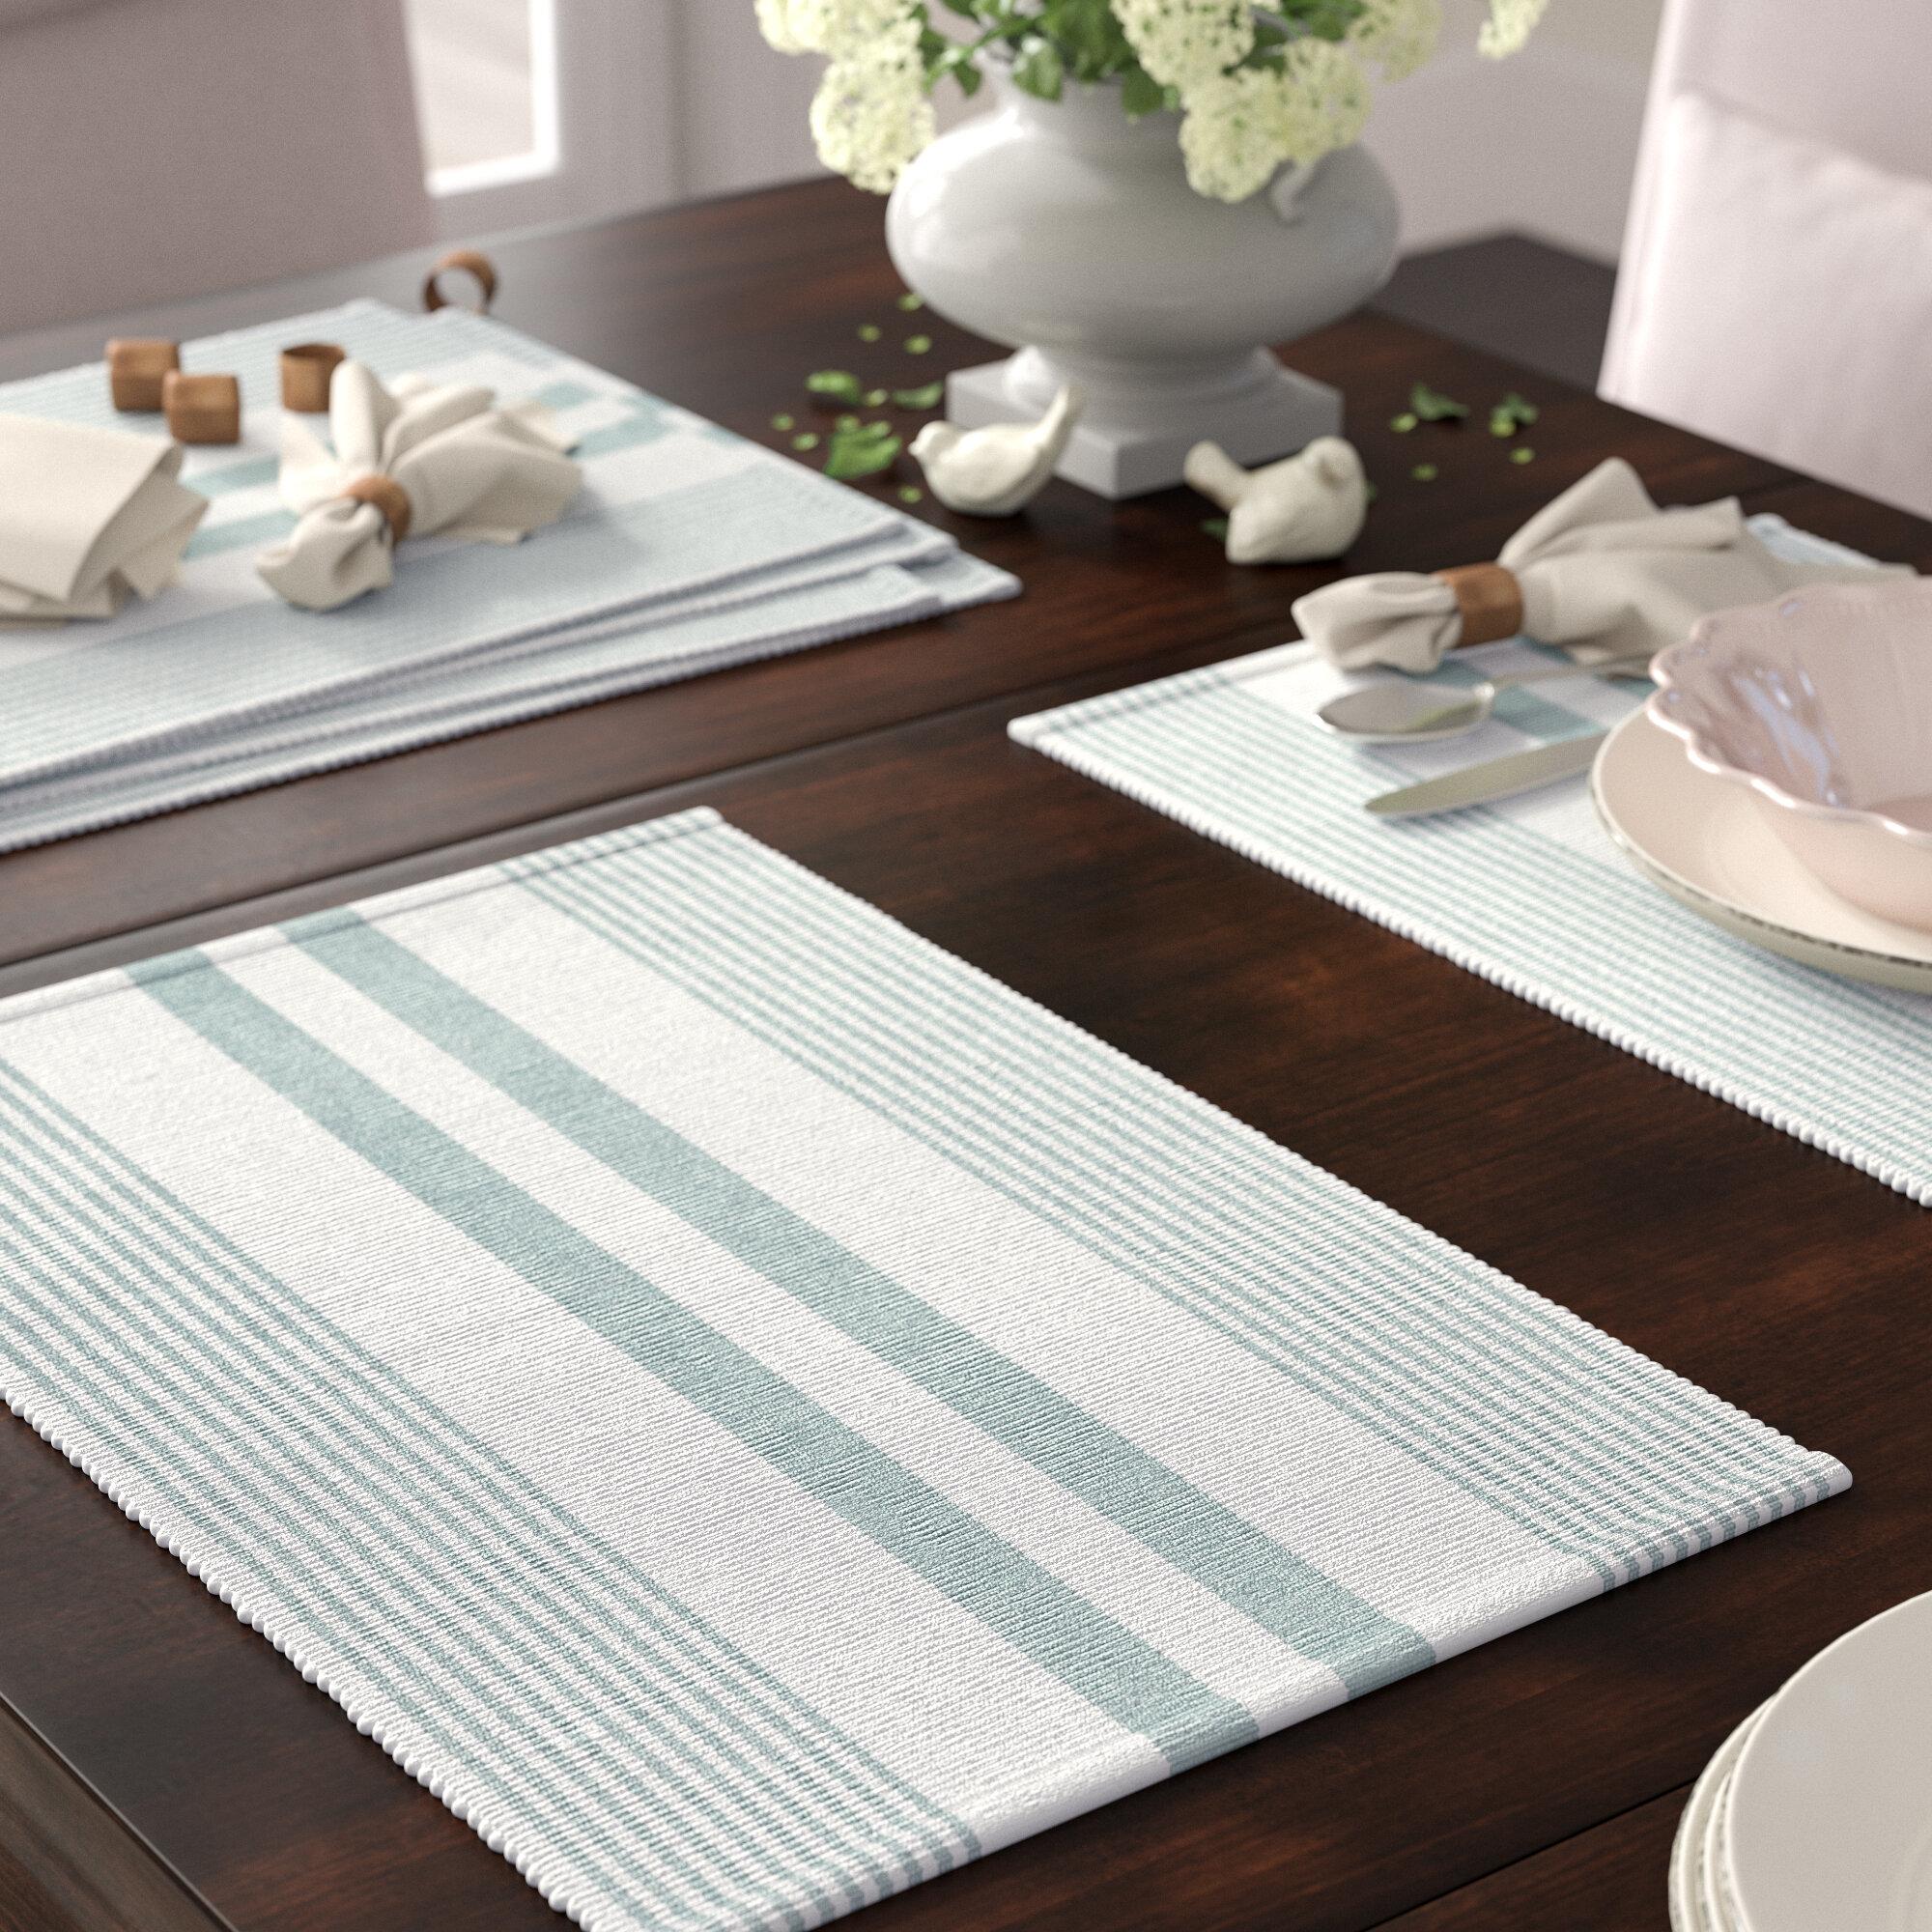 Stir Things Up Cream Stripe 11 x 11 Cotton Linen Fabric Dish Covers Set of 3